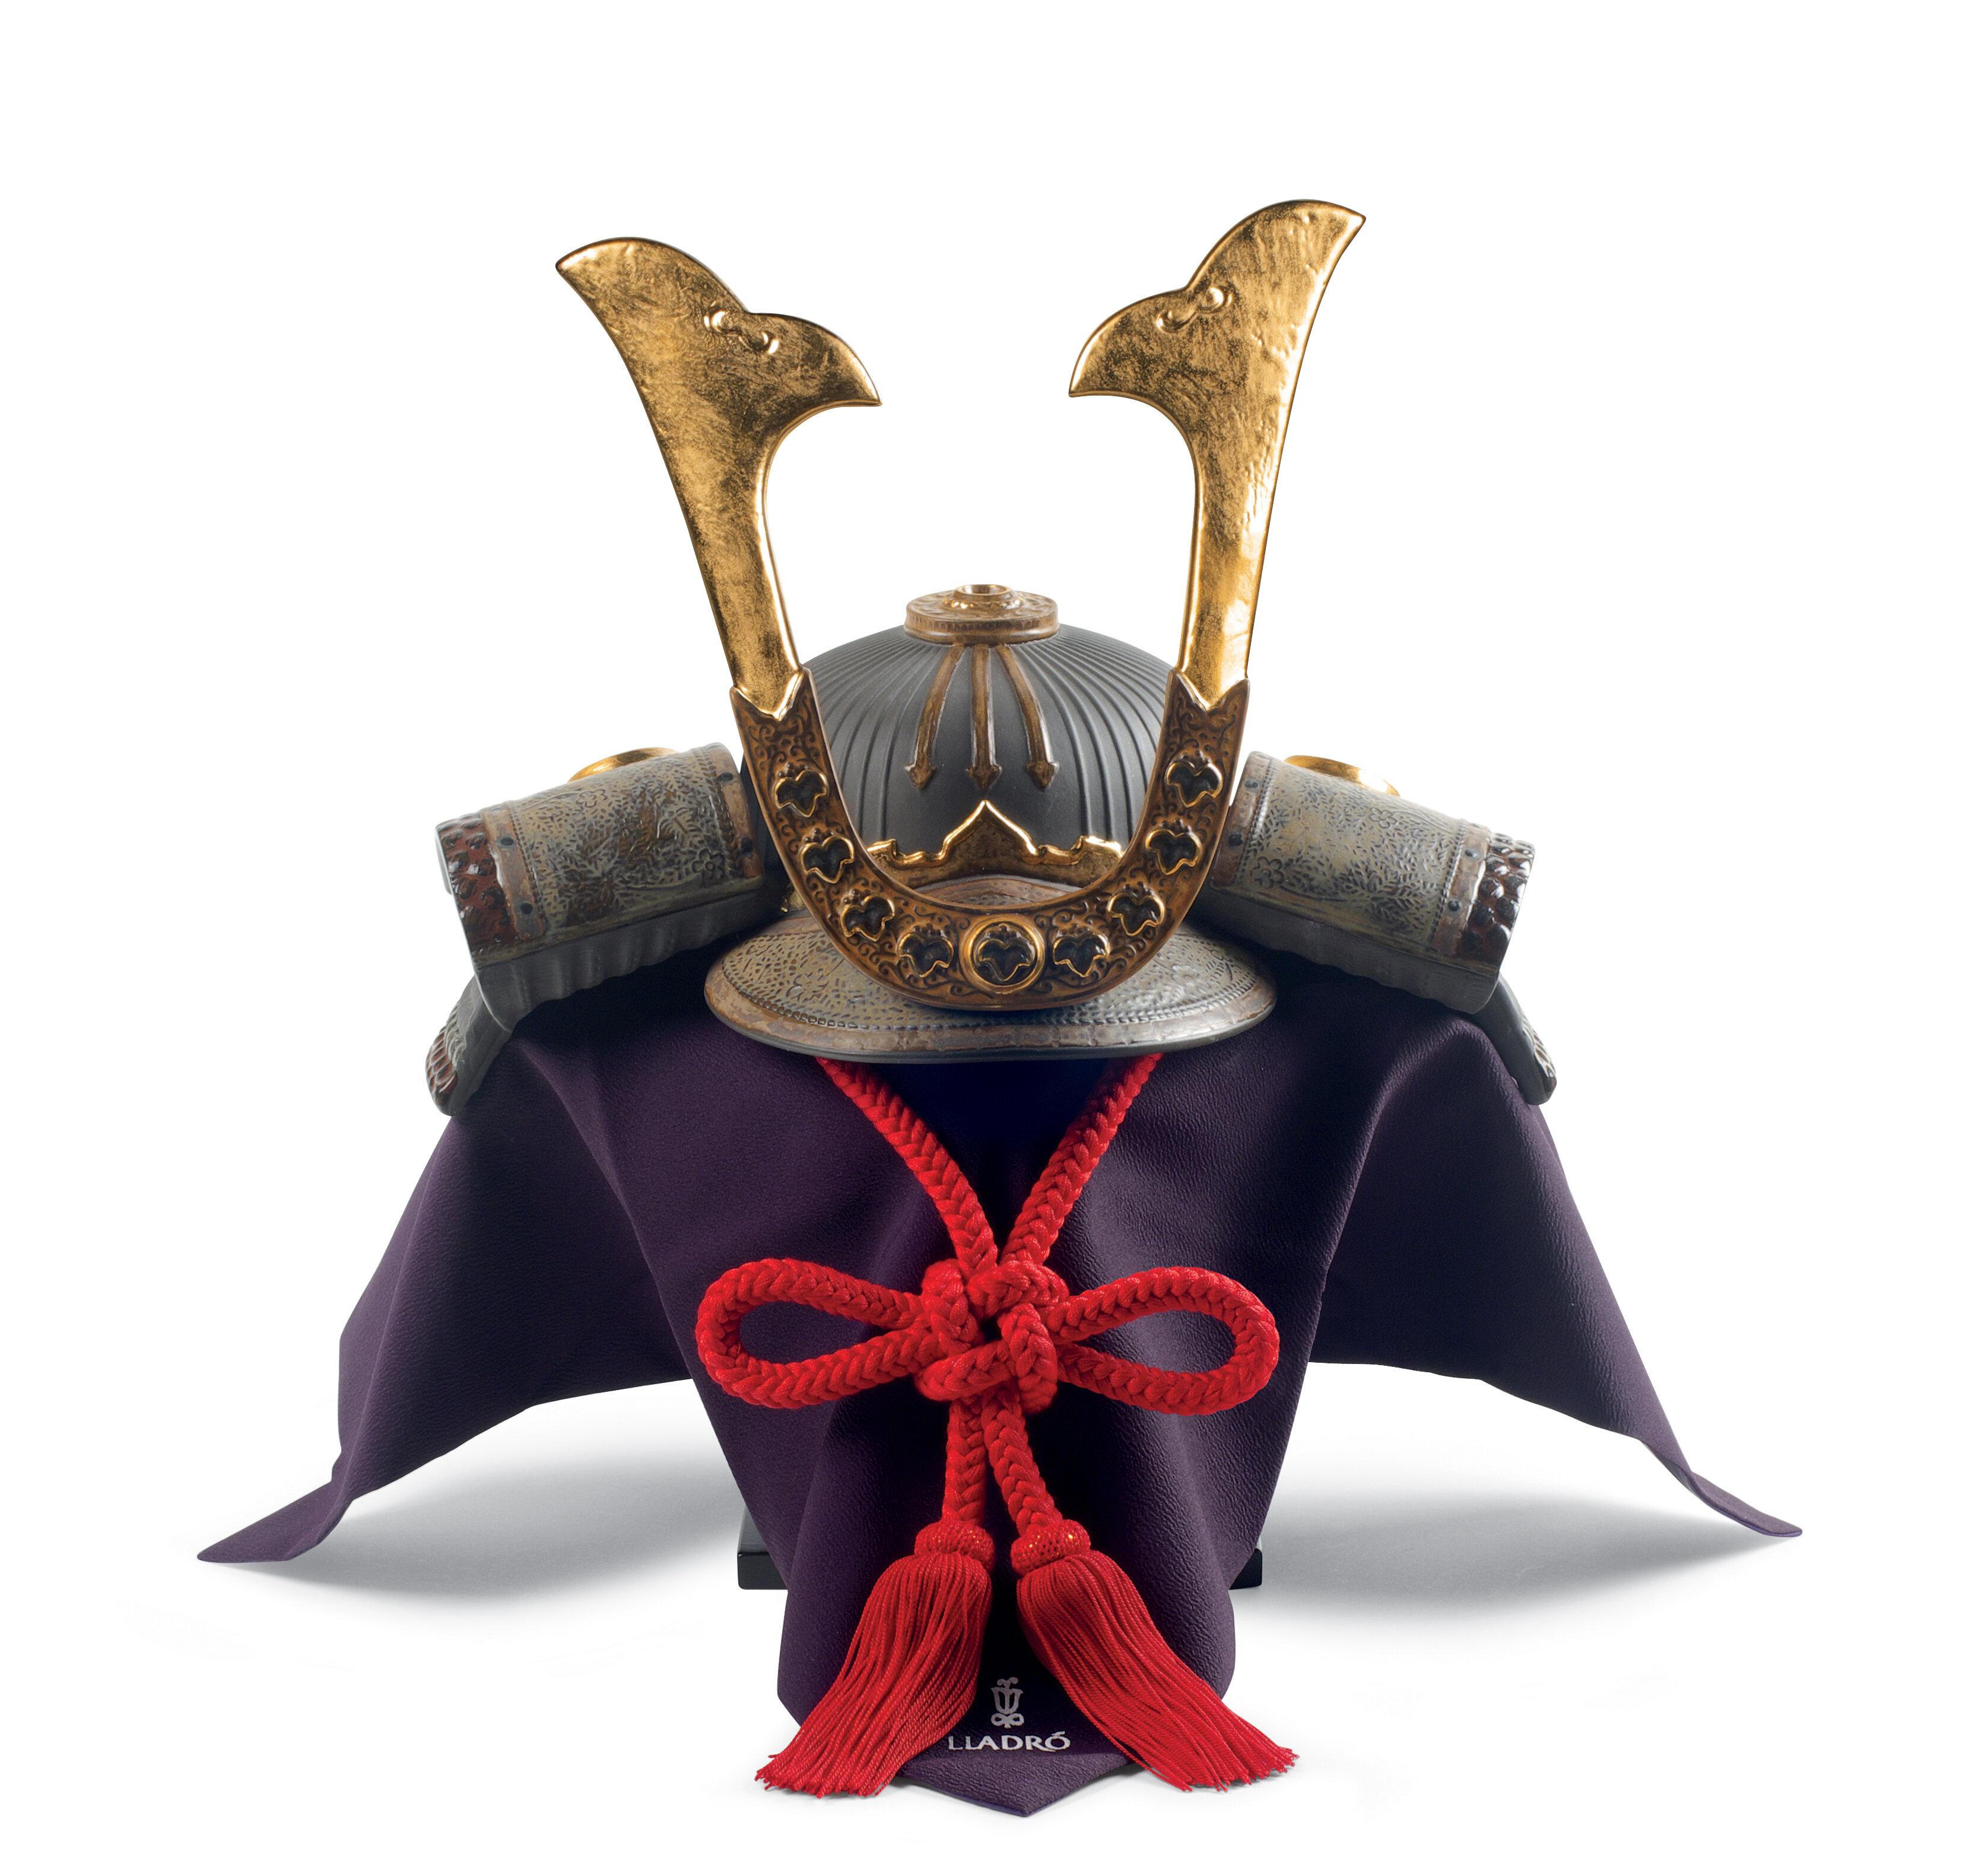 Lladro Samurai Helmet Sculpture Wayfair